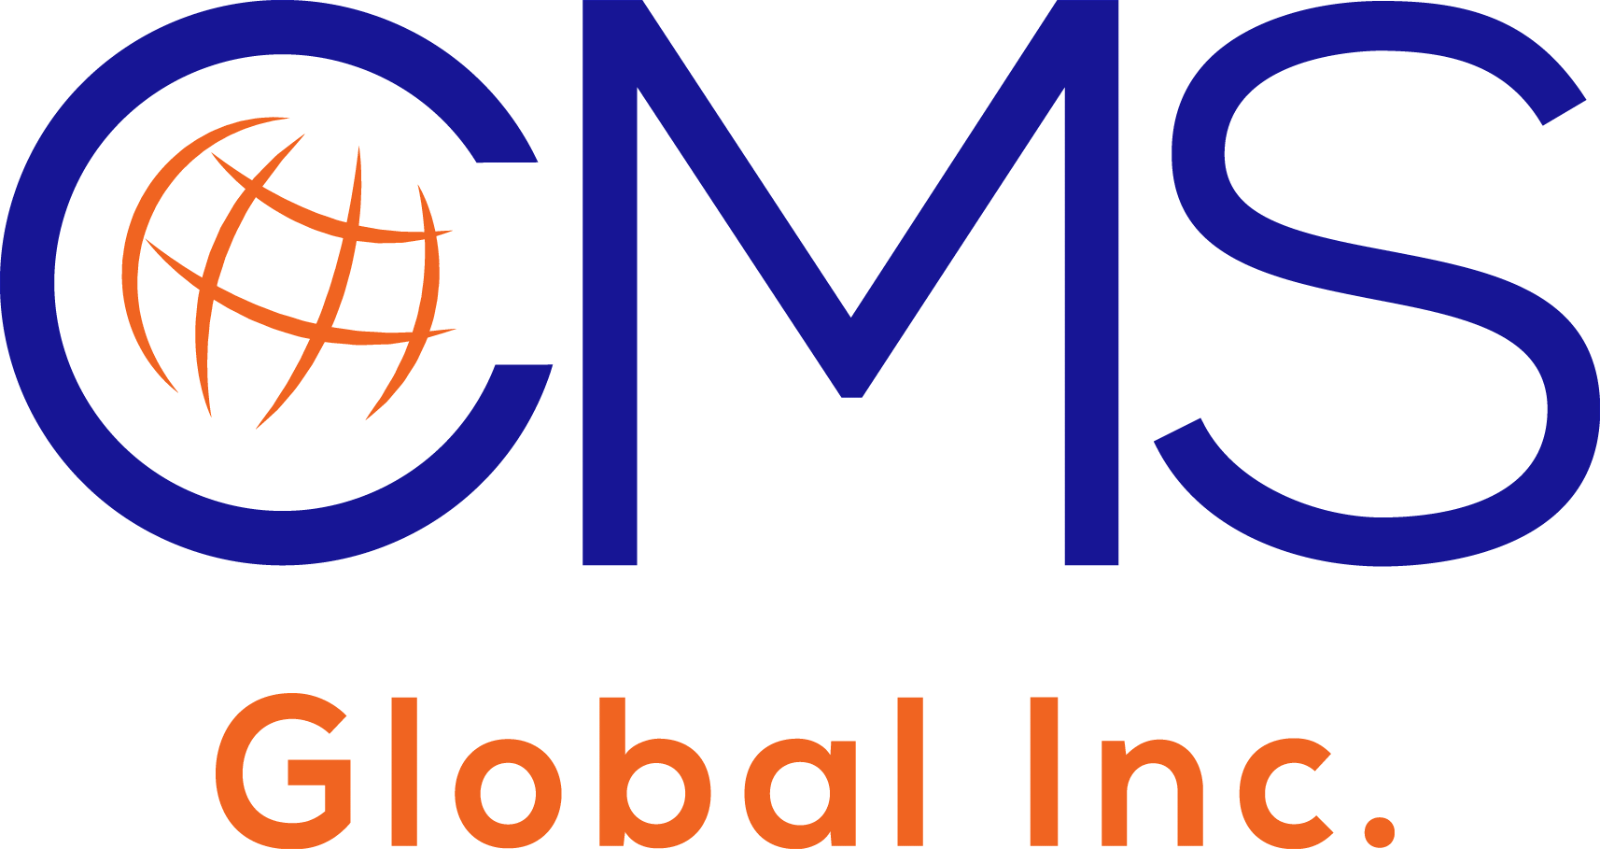 CMS Global logo